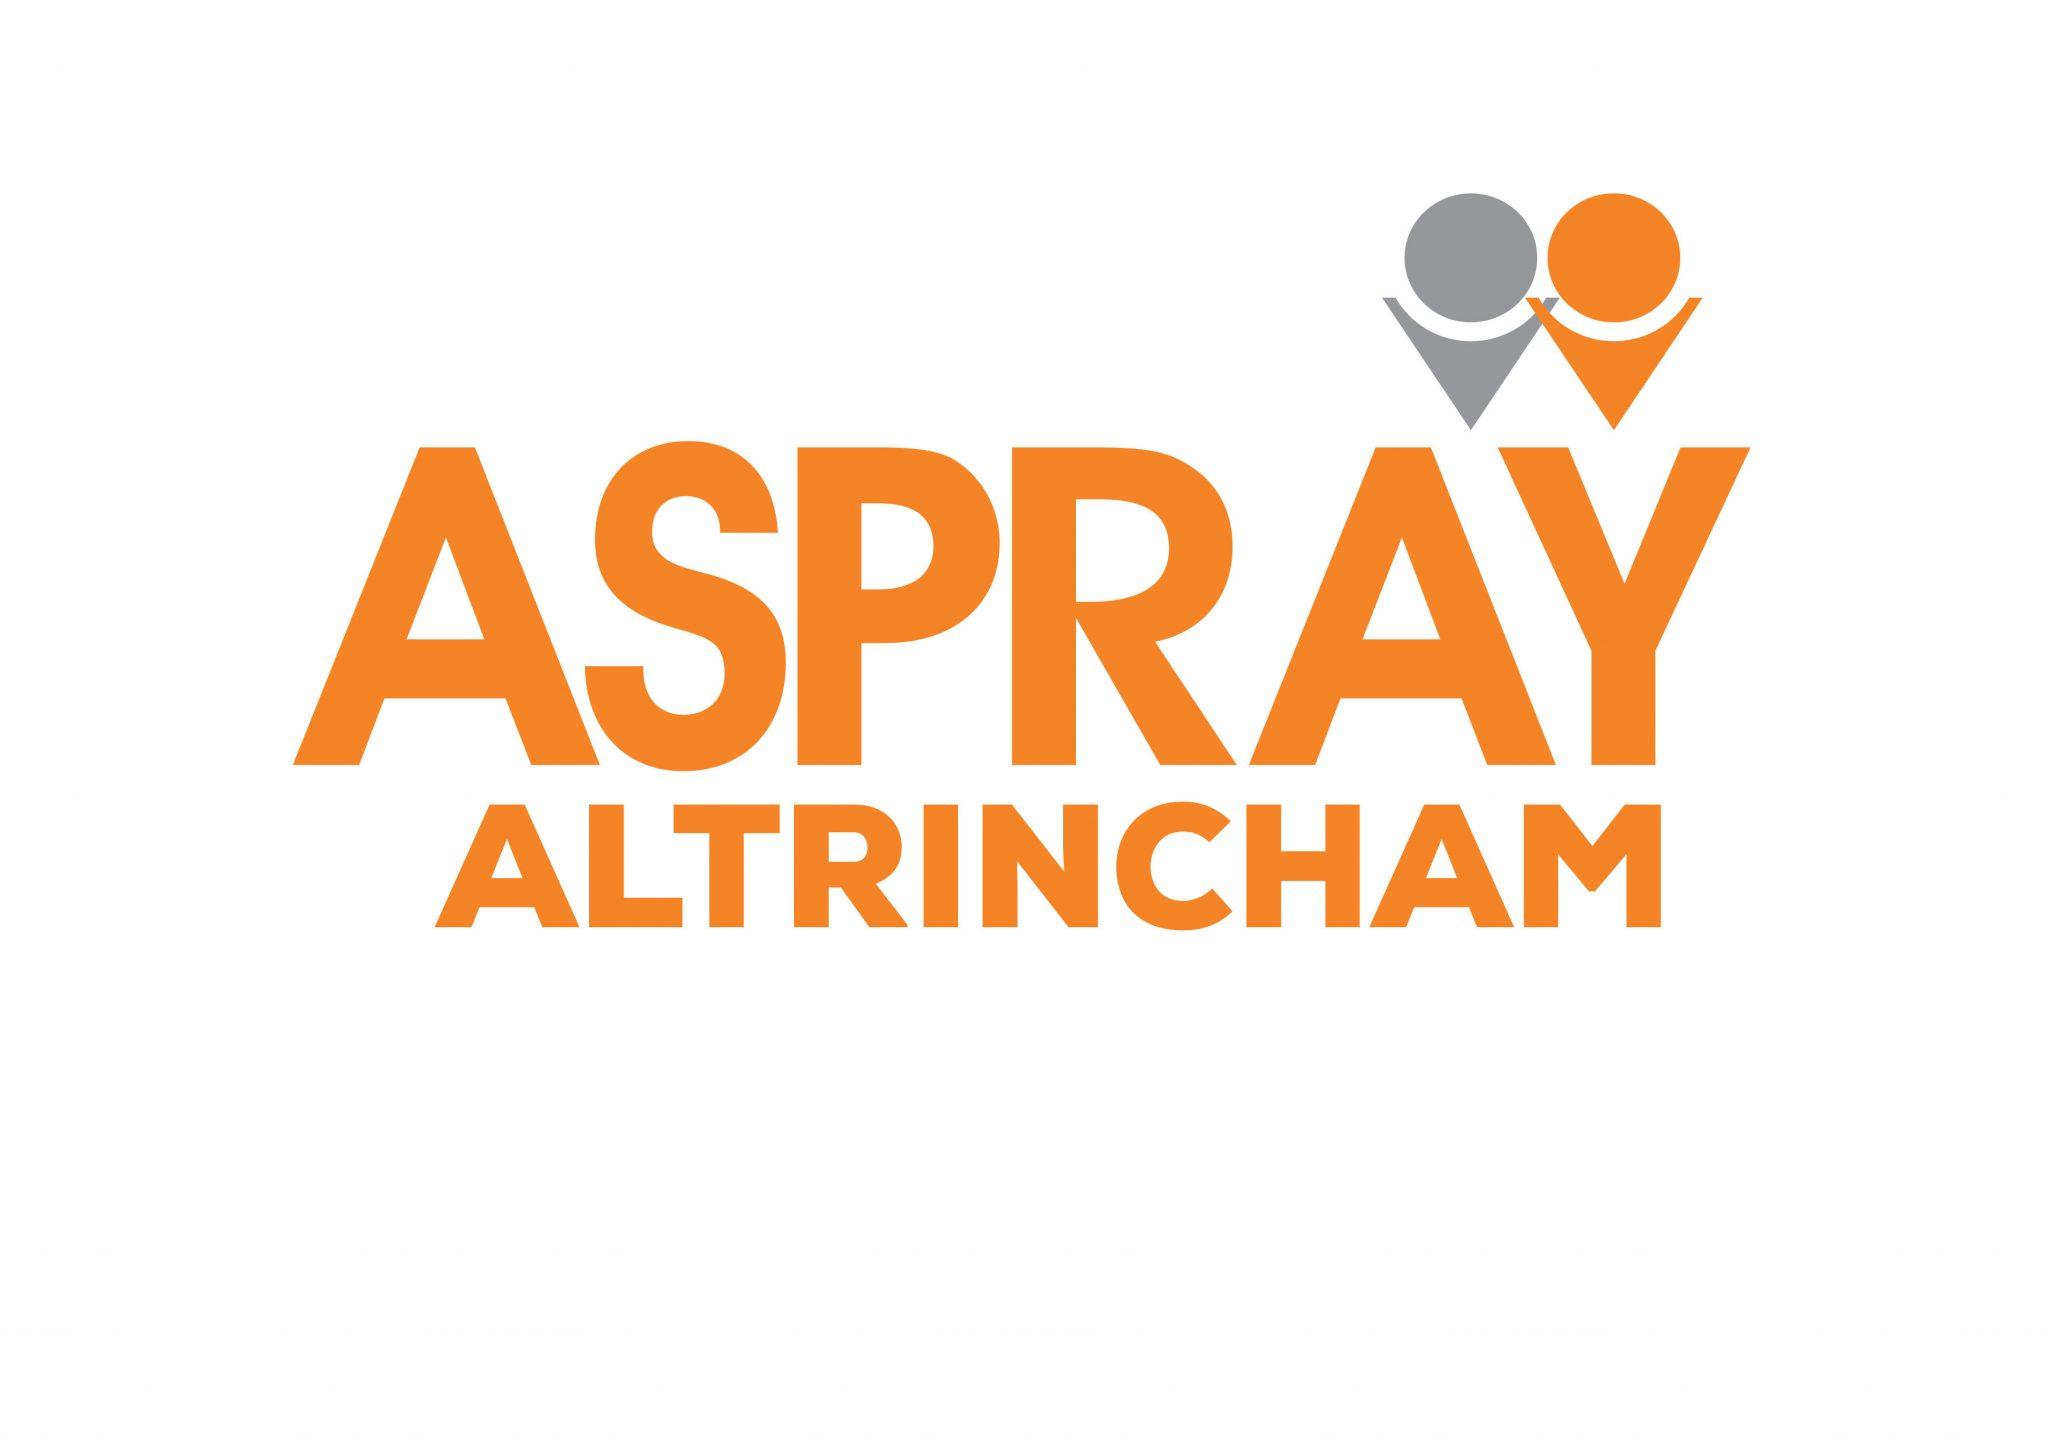 Aspray-Altrincham